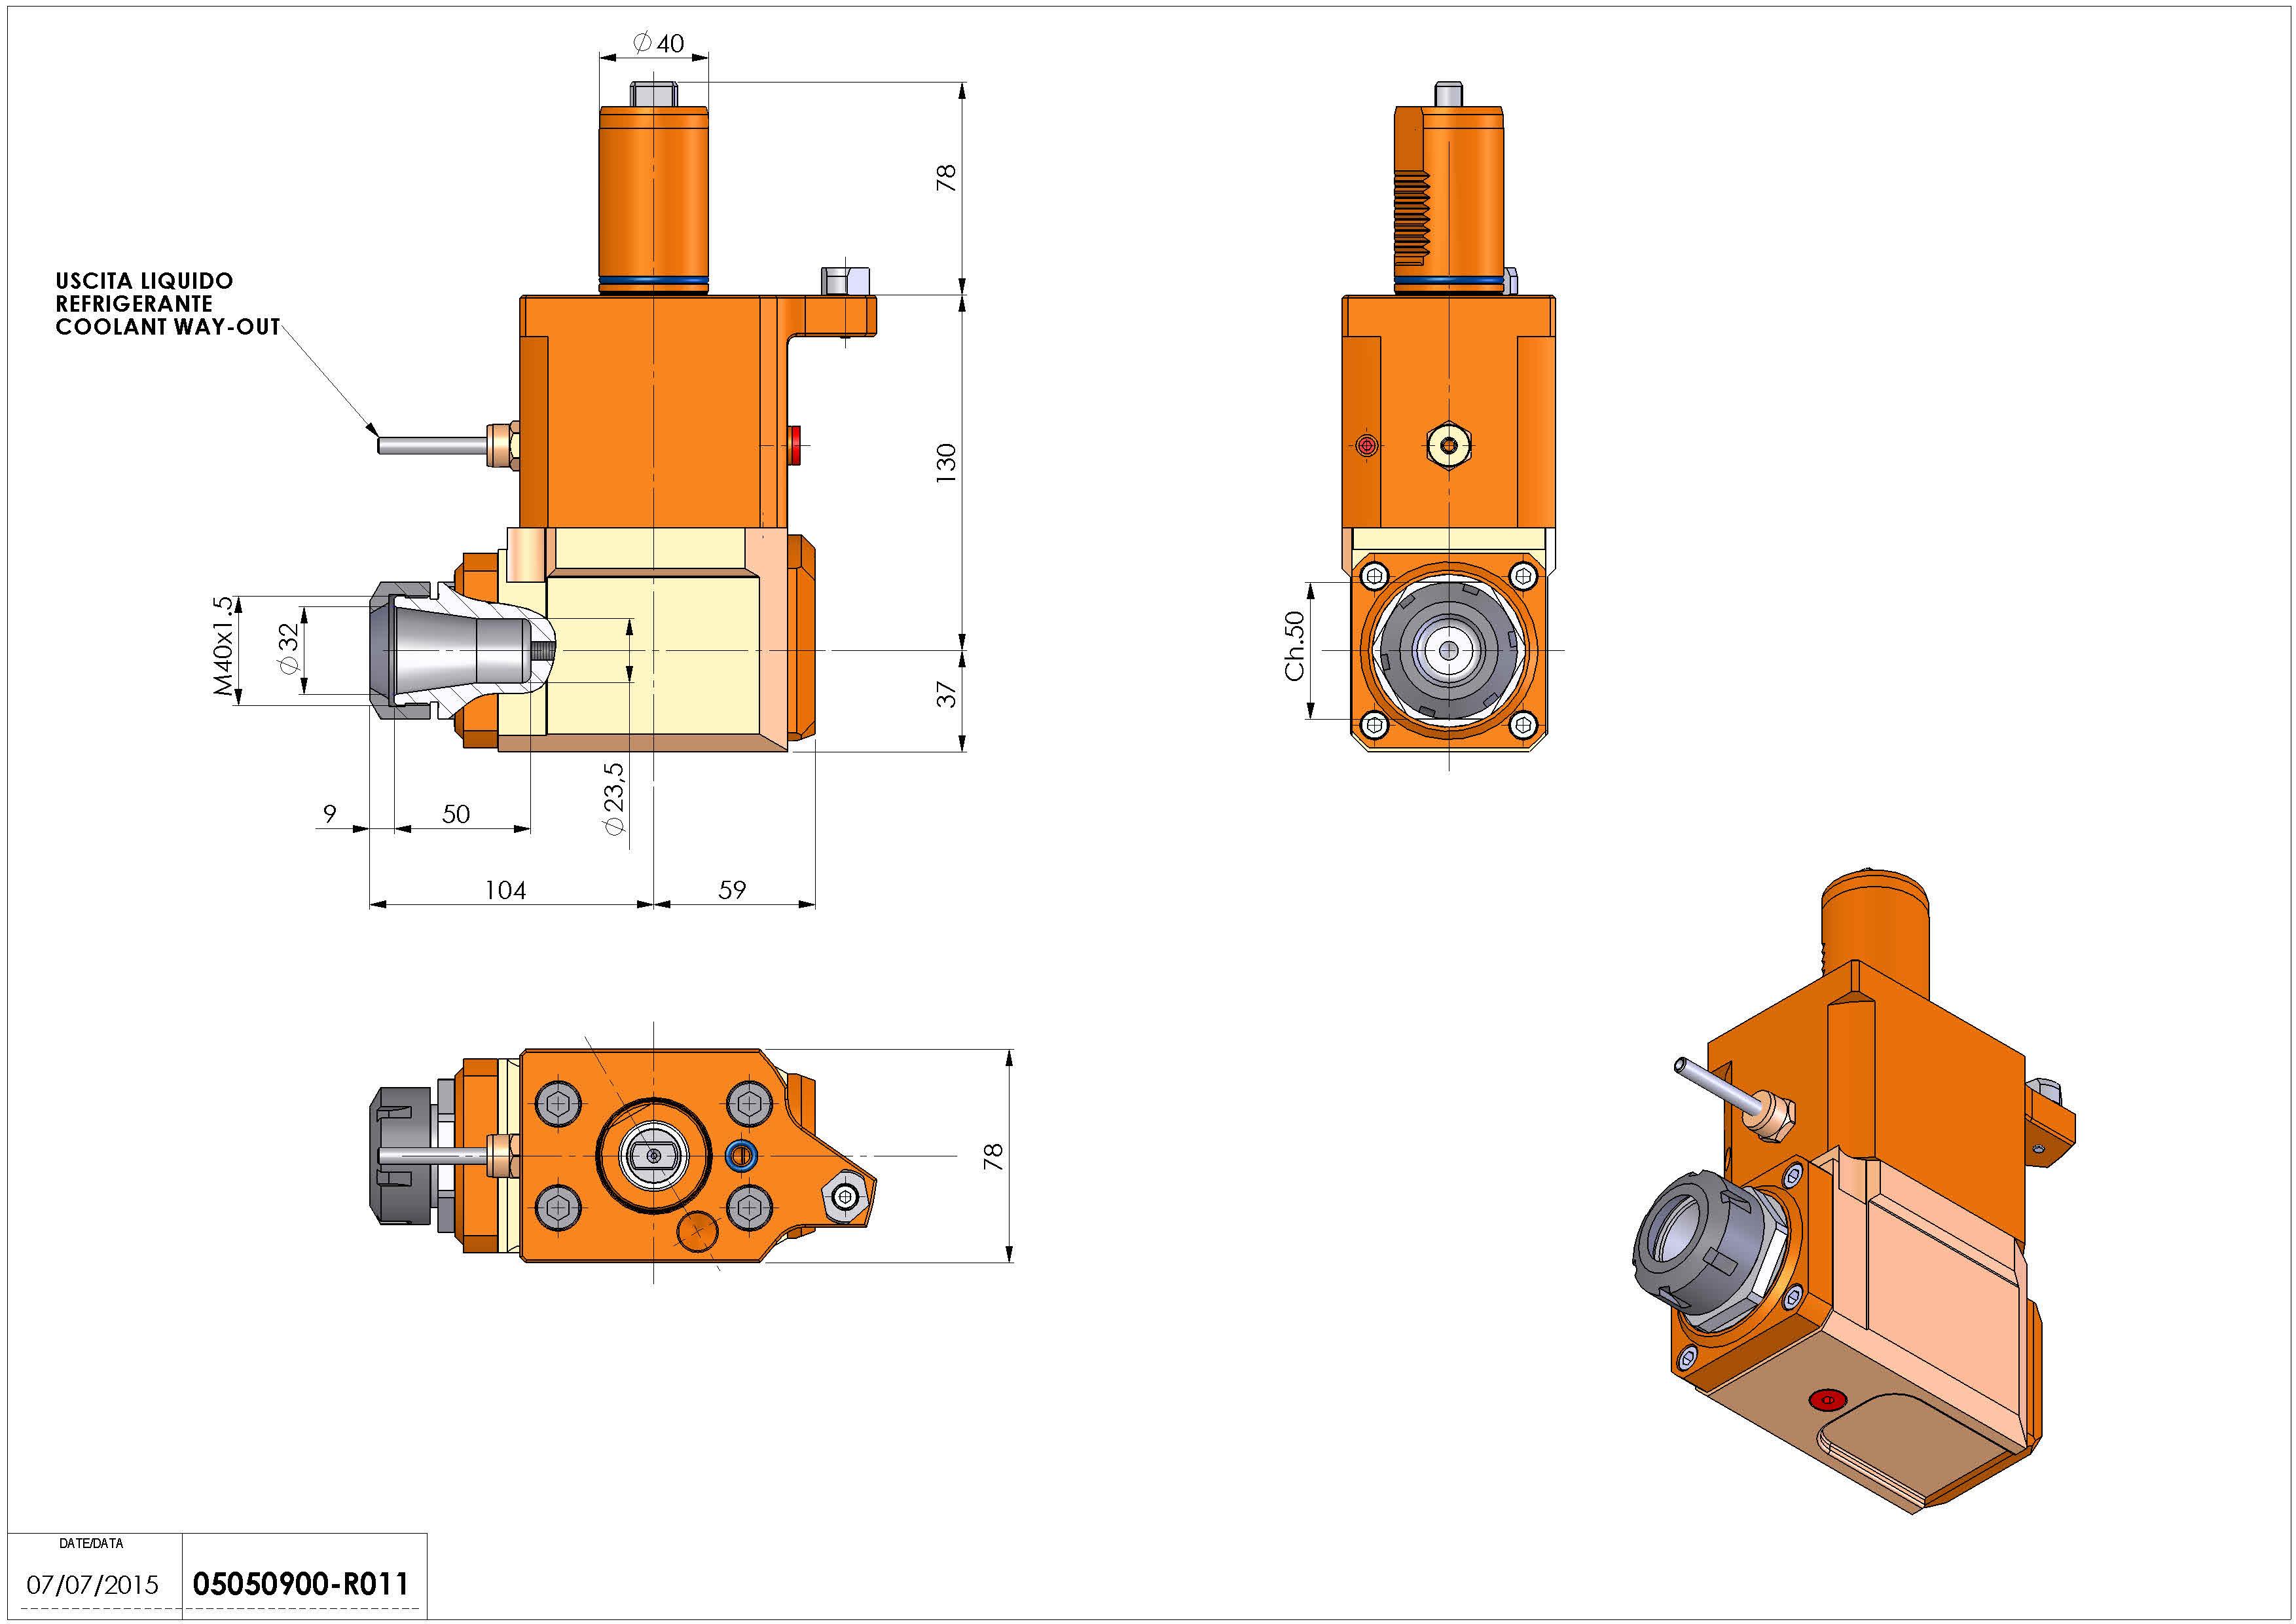 Technical image - LT-A VDI40 ER32 L H130 MZ.